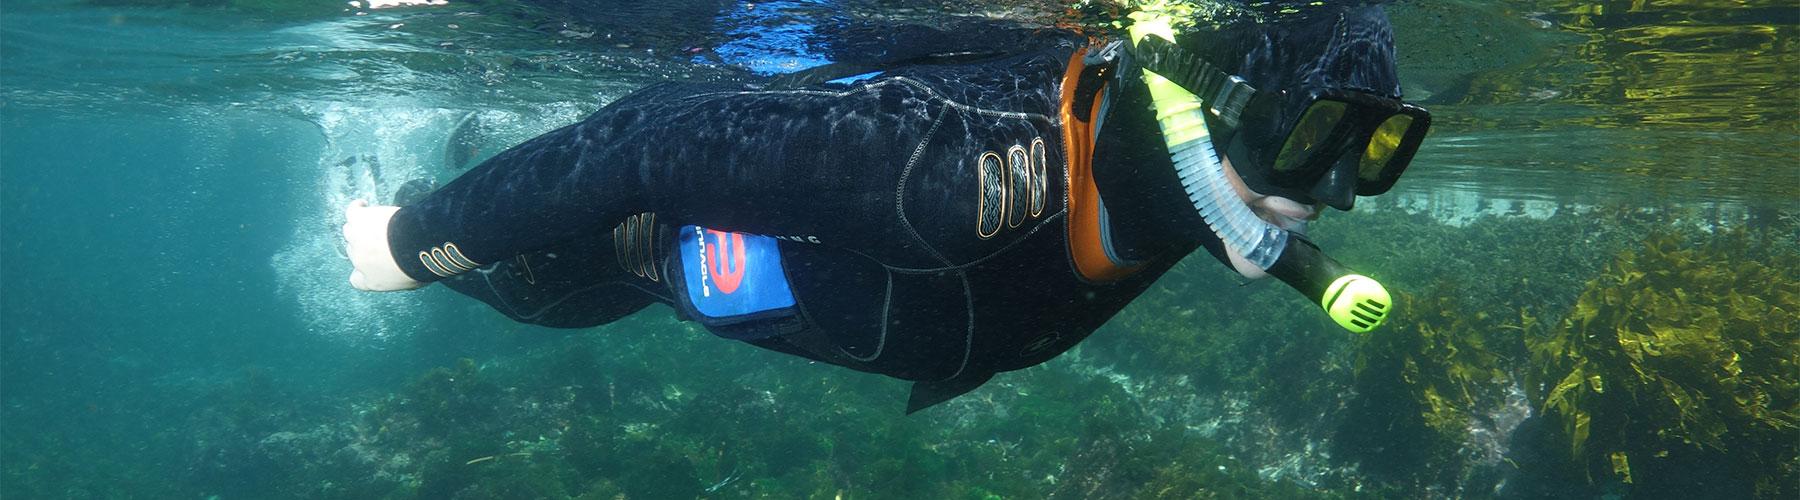 Paihia Dive snorkling